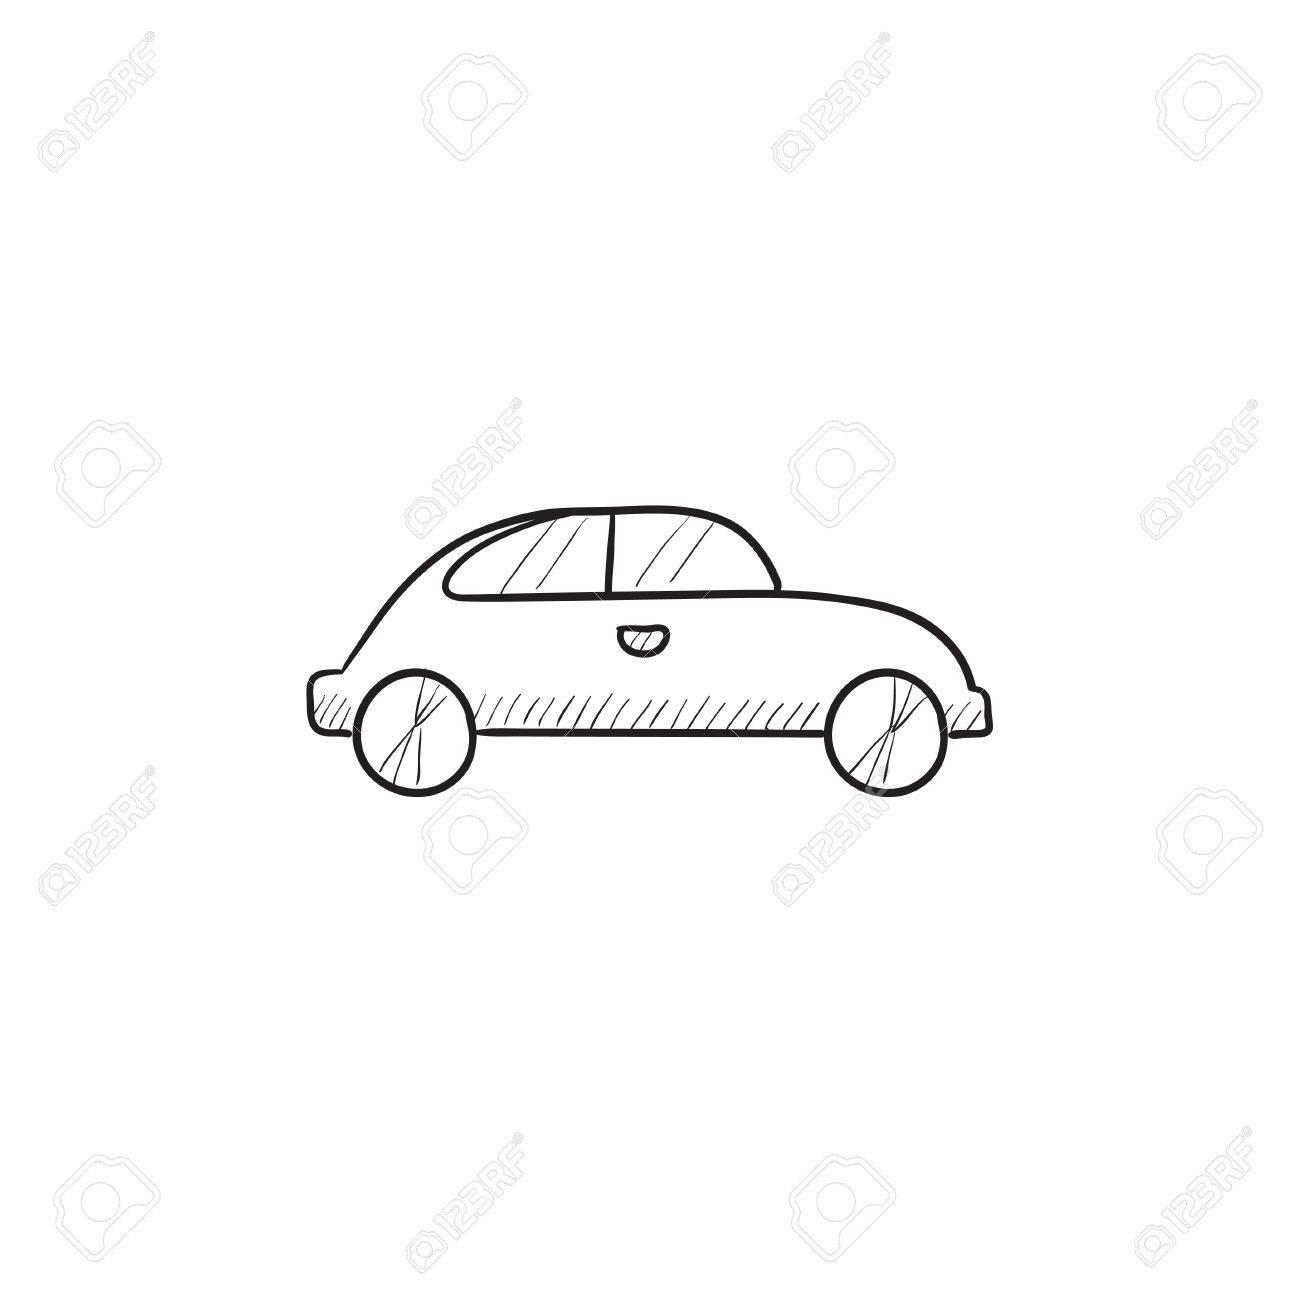 Beste Auto Skizze Website Ideen - Die Besten Elektrischen Schaltplan ...